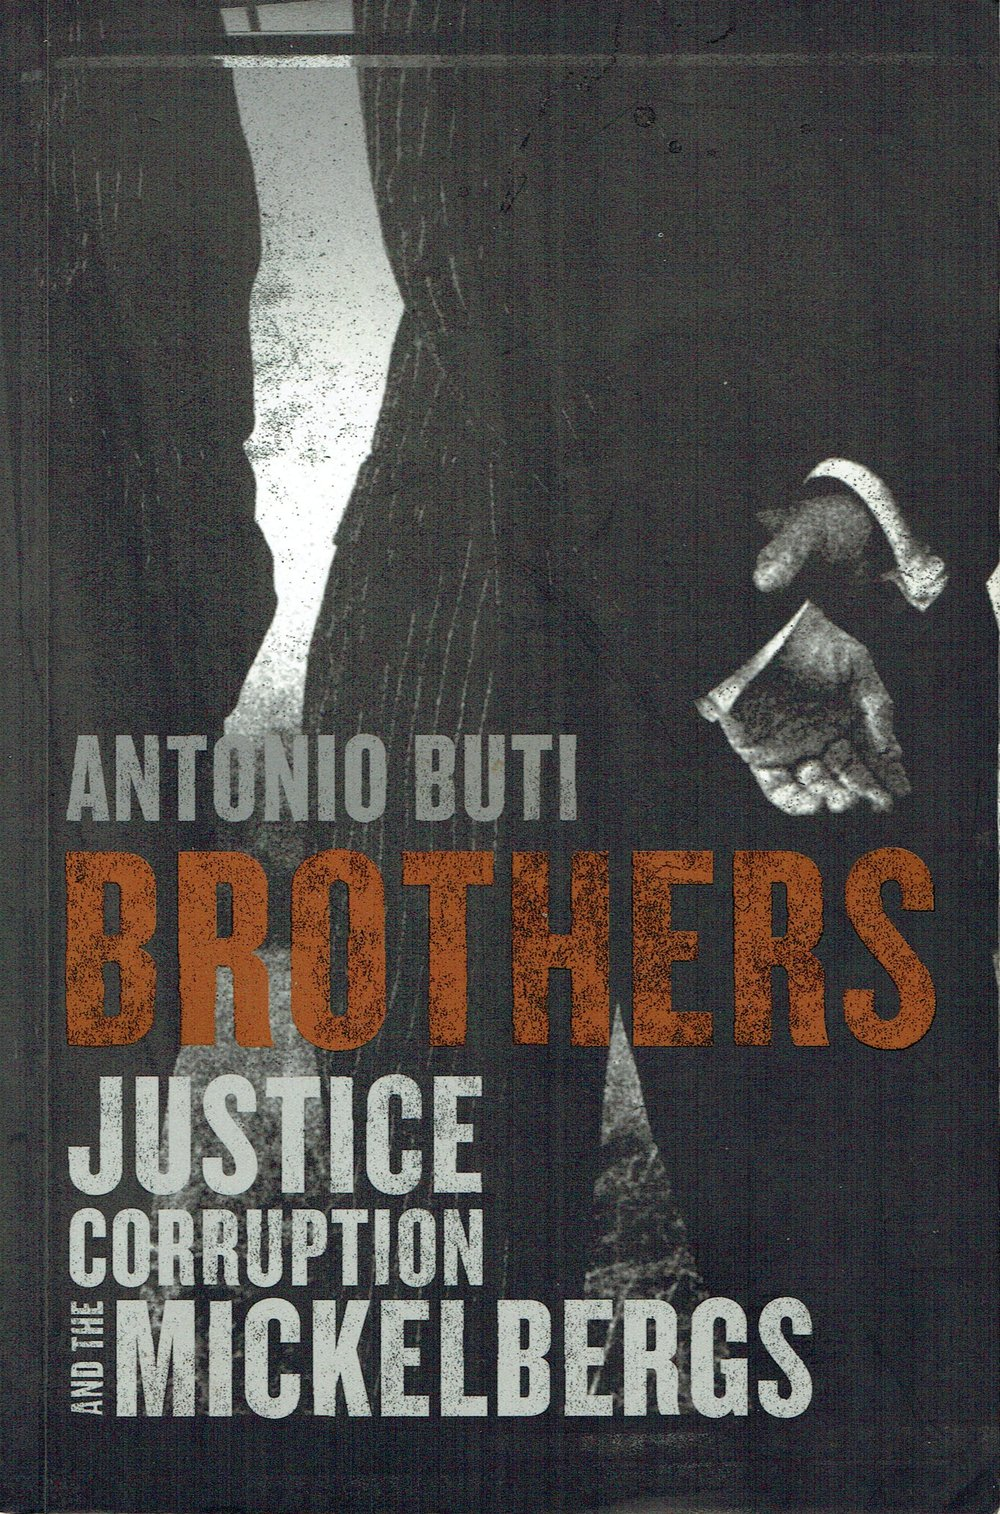 Brothers : Justice, corruption and the Mickelbergs Antonio Buti